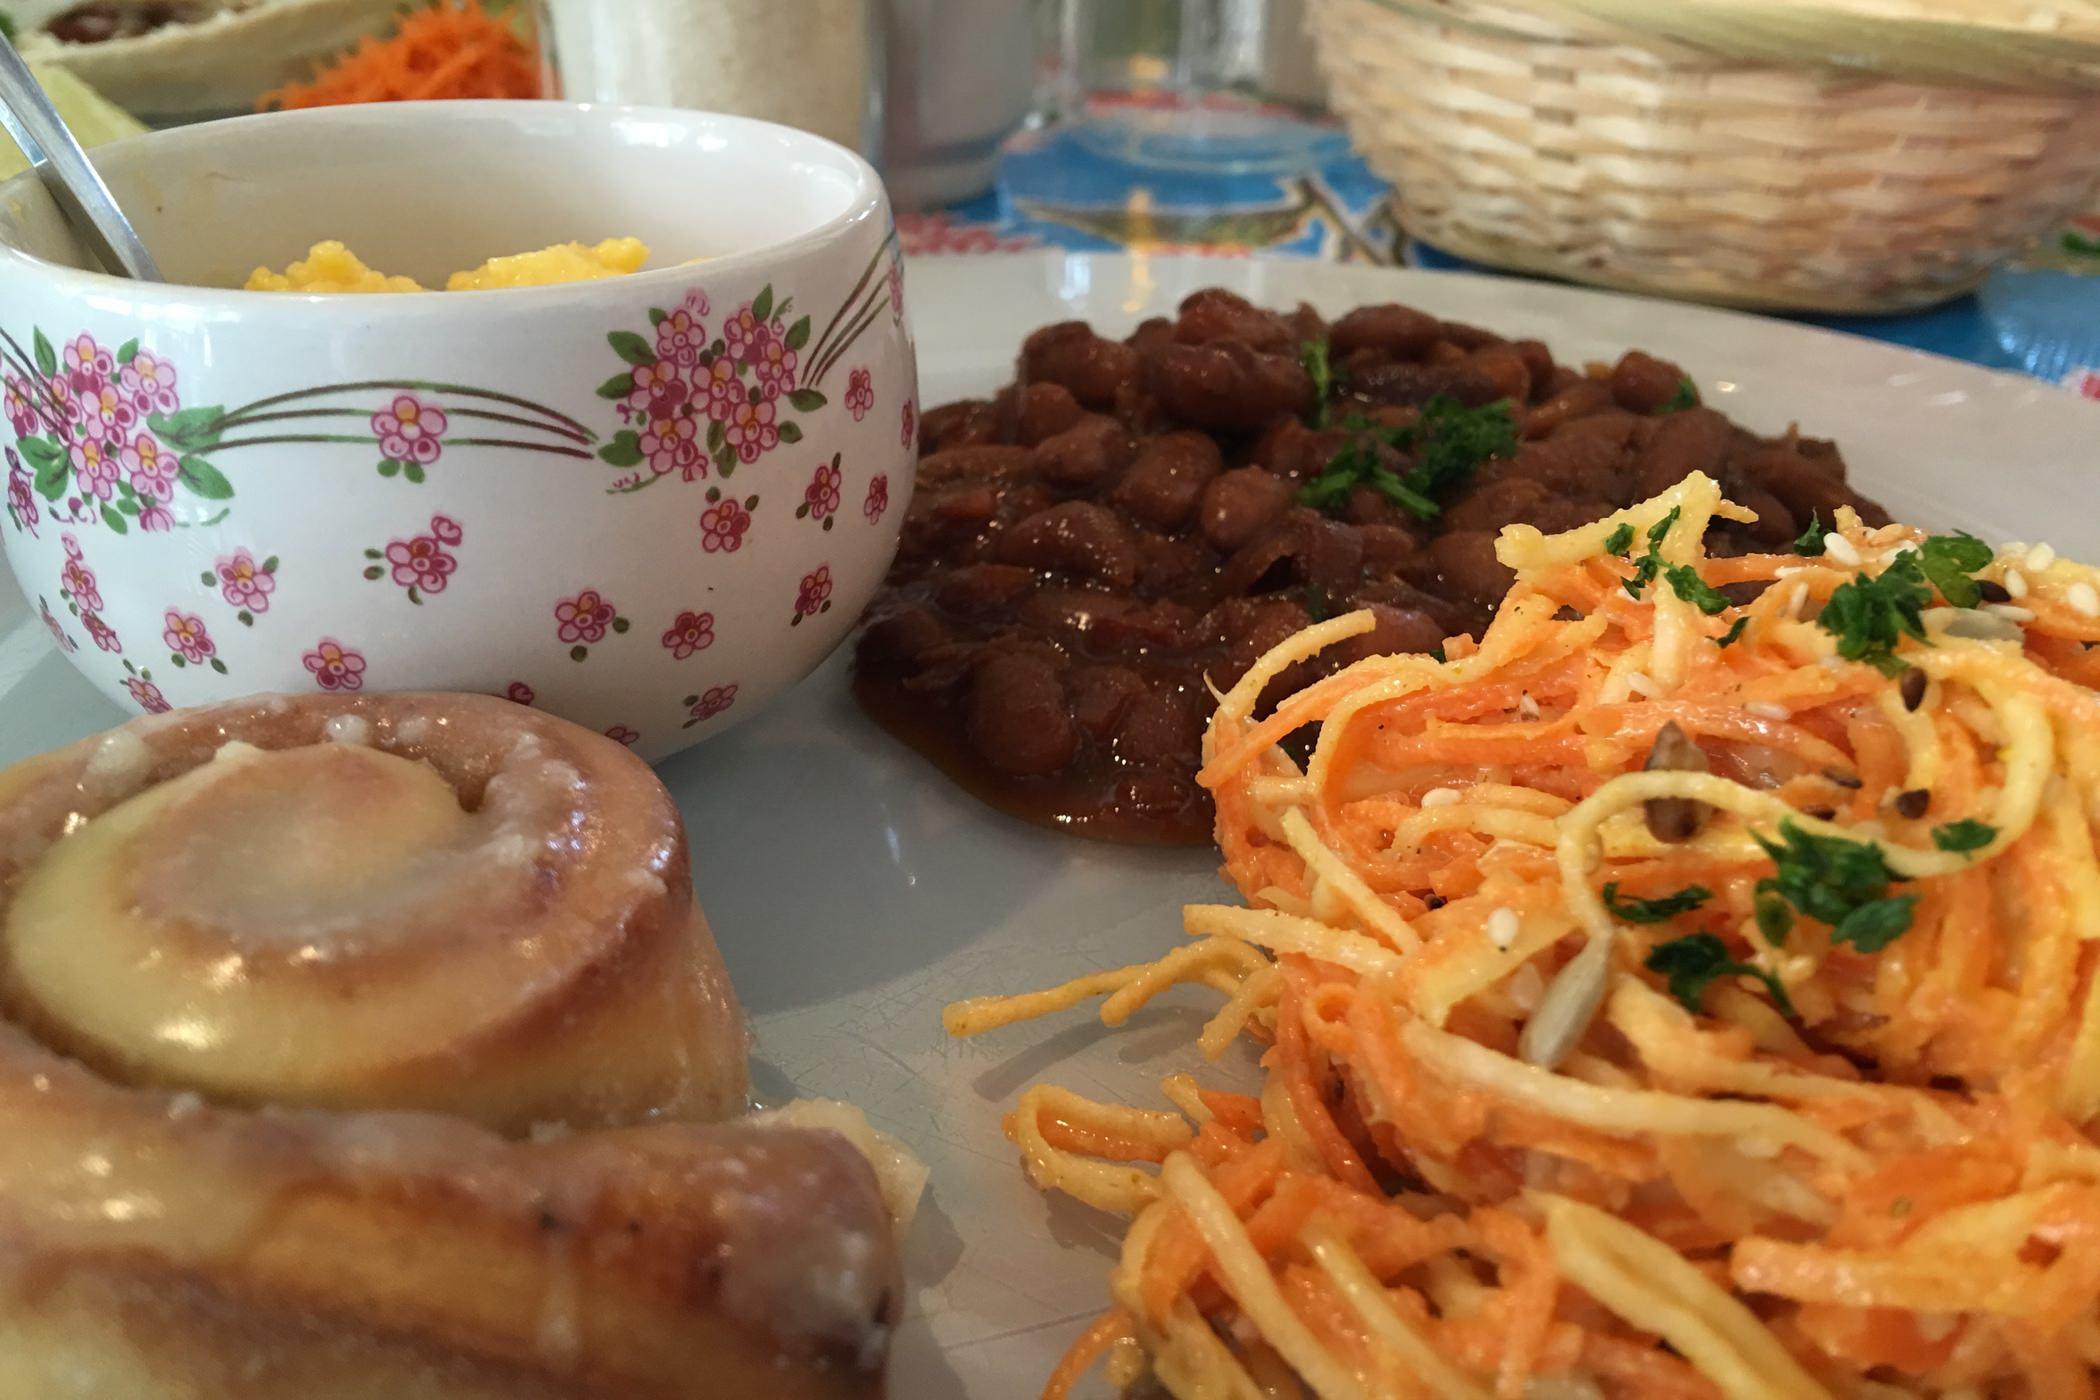 rita-plage-assiette-ostie-calice